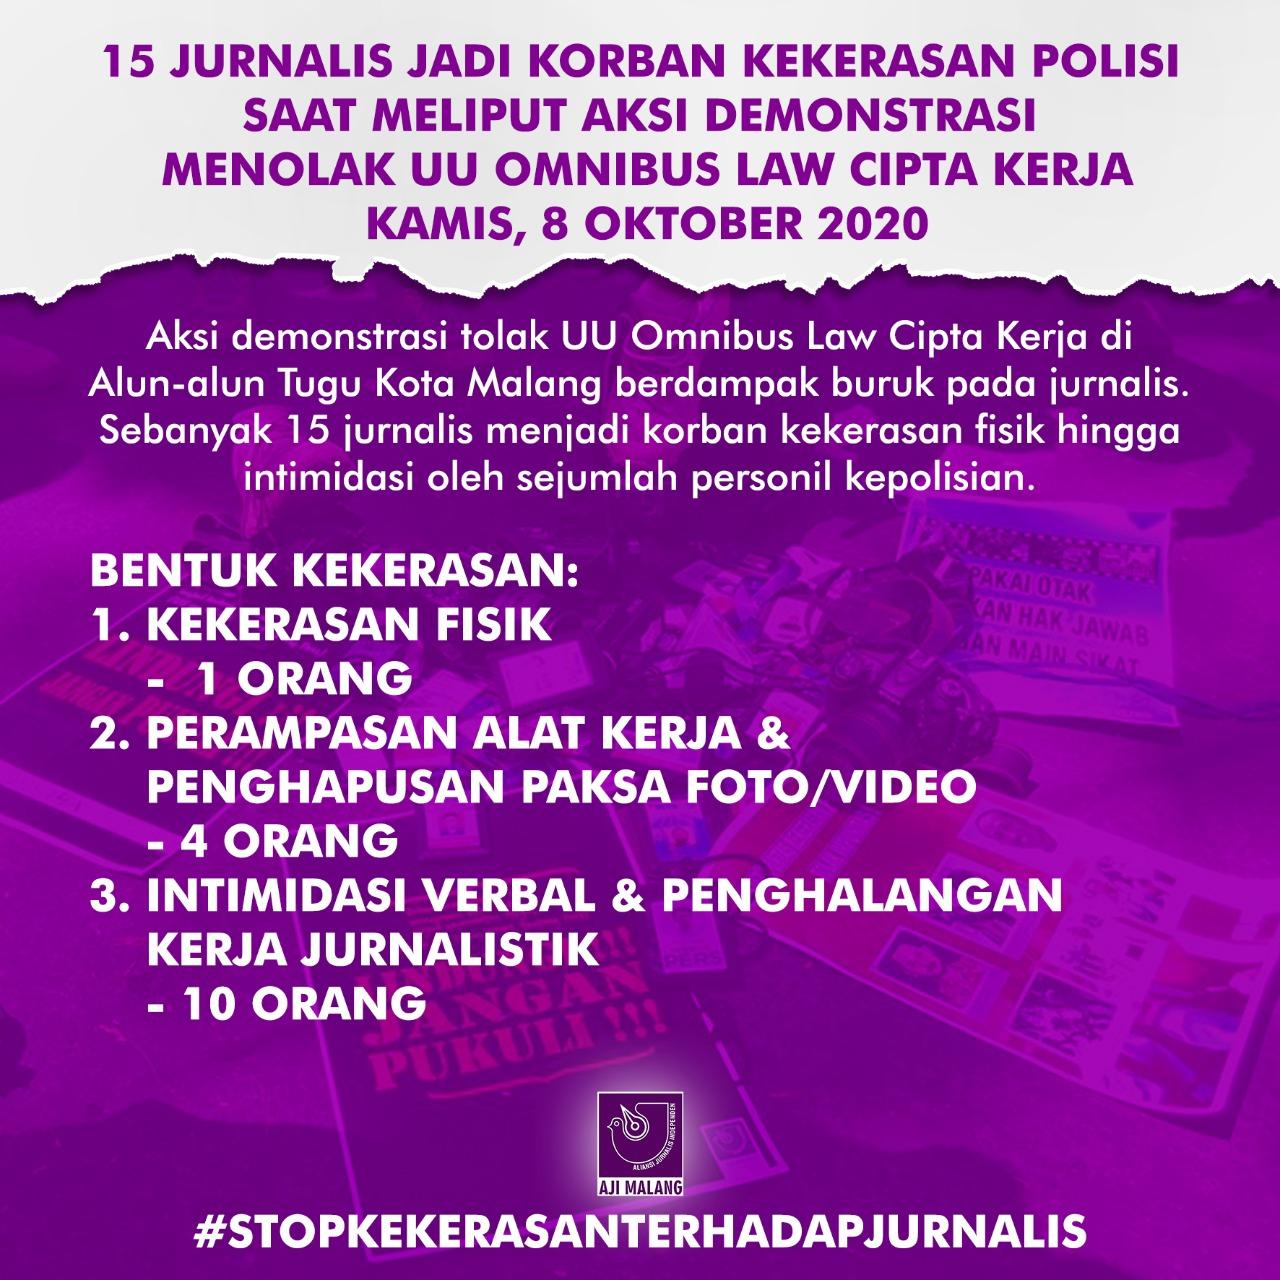 Pernyataan Sikap : Tolak dan Usut Kasus Kekerasan Terhadap Jurnalis di Malang